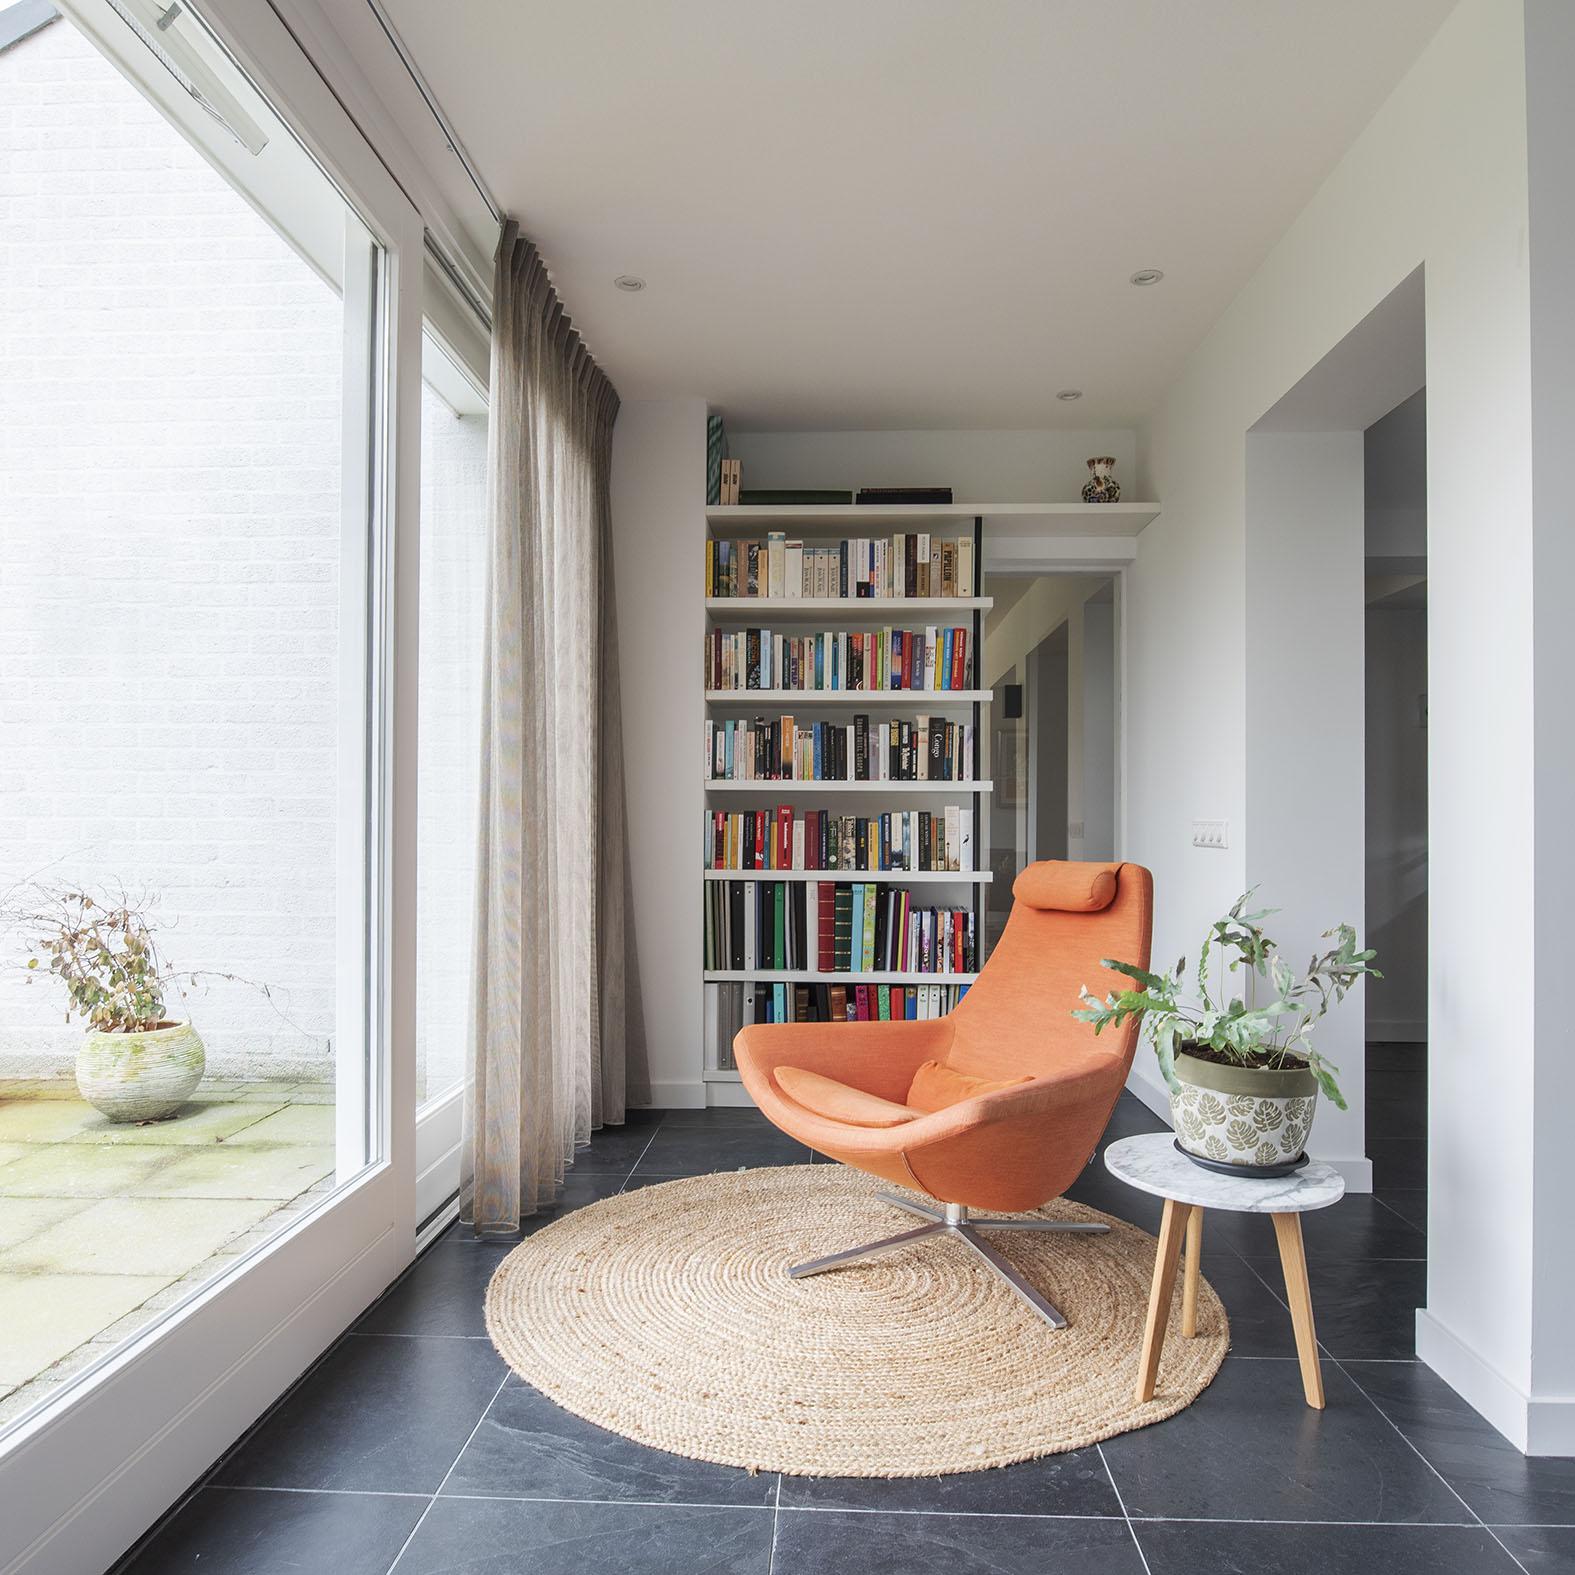 interieuradvies Den Bosch engelen eetkamer huiskamer stylen leeshoek design meubels styling interieurontwerp